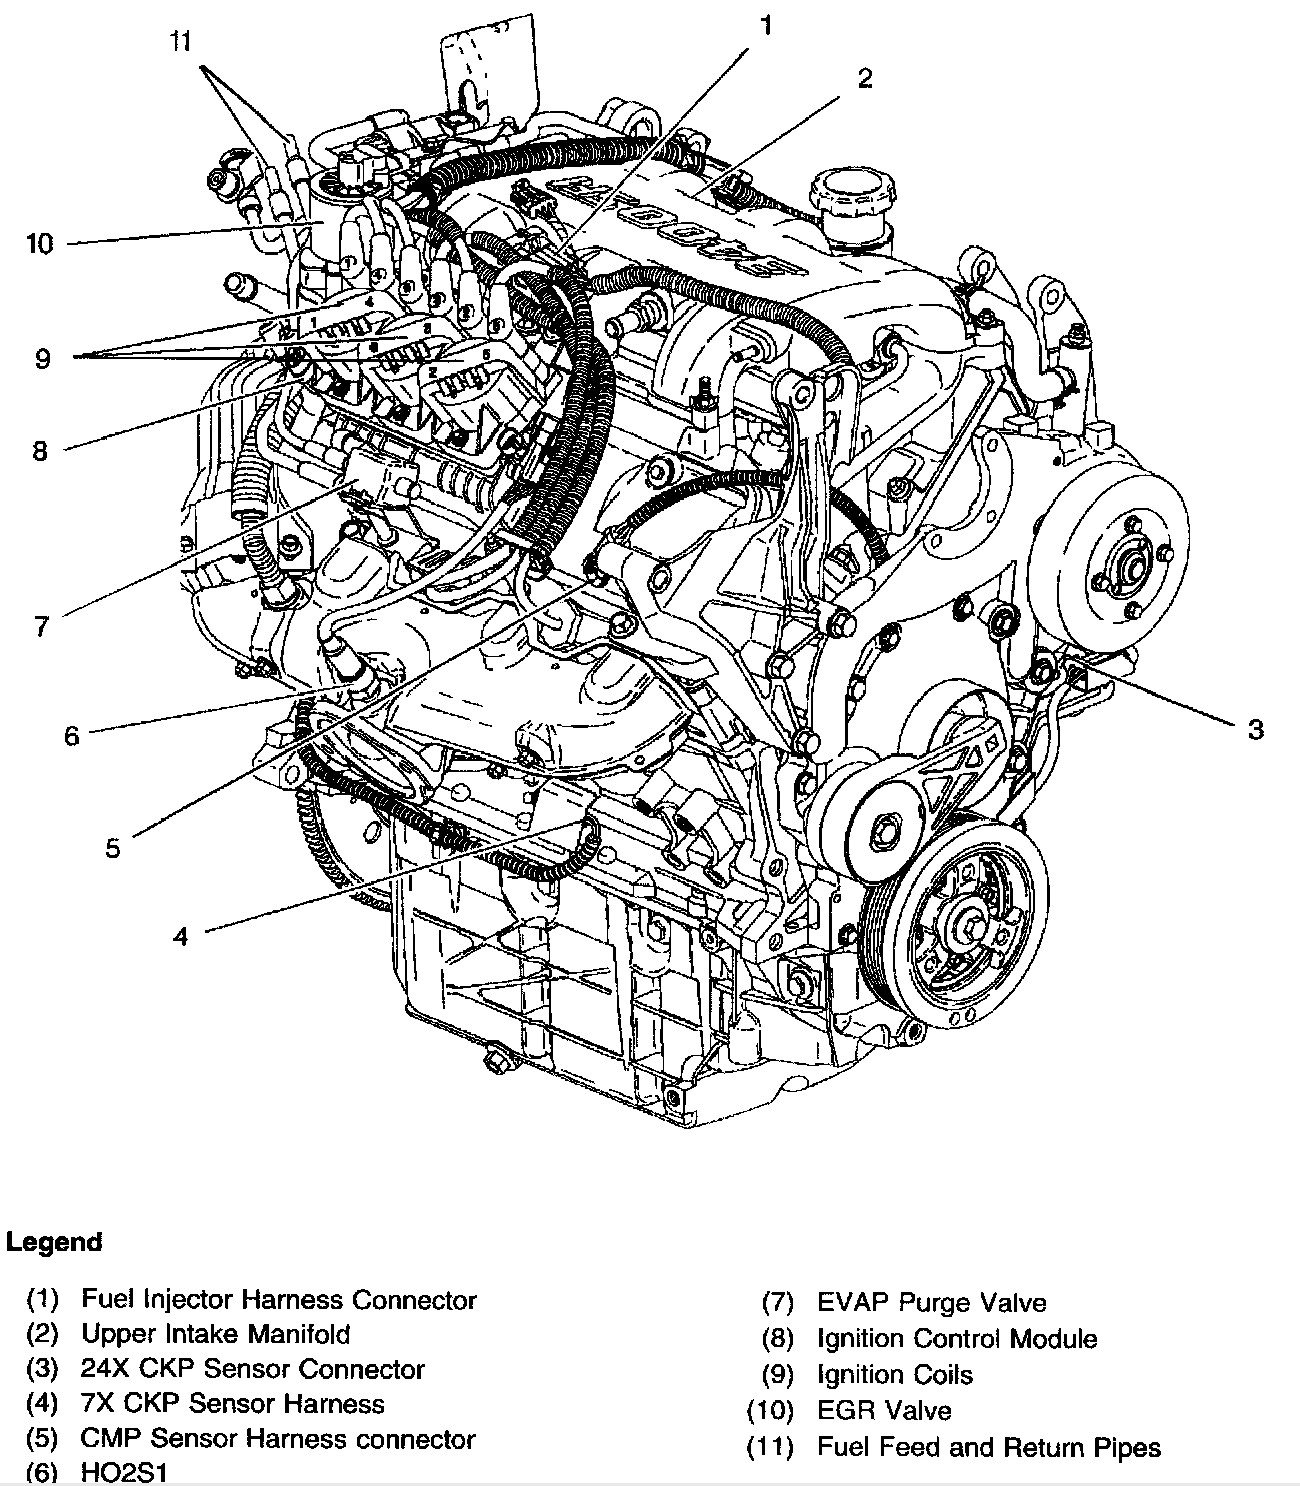 350 Vortec Engine Diagram - machine learning on